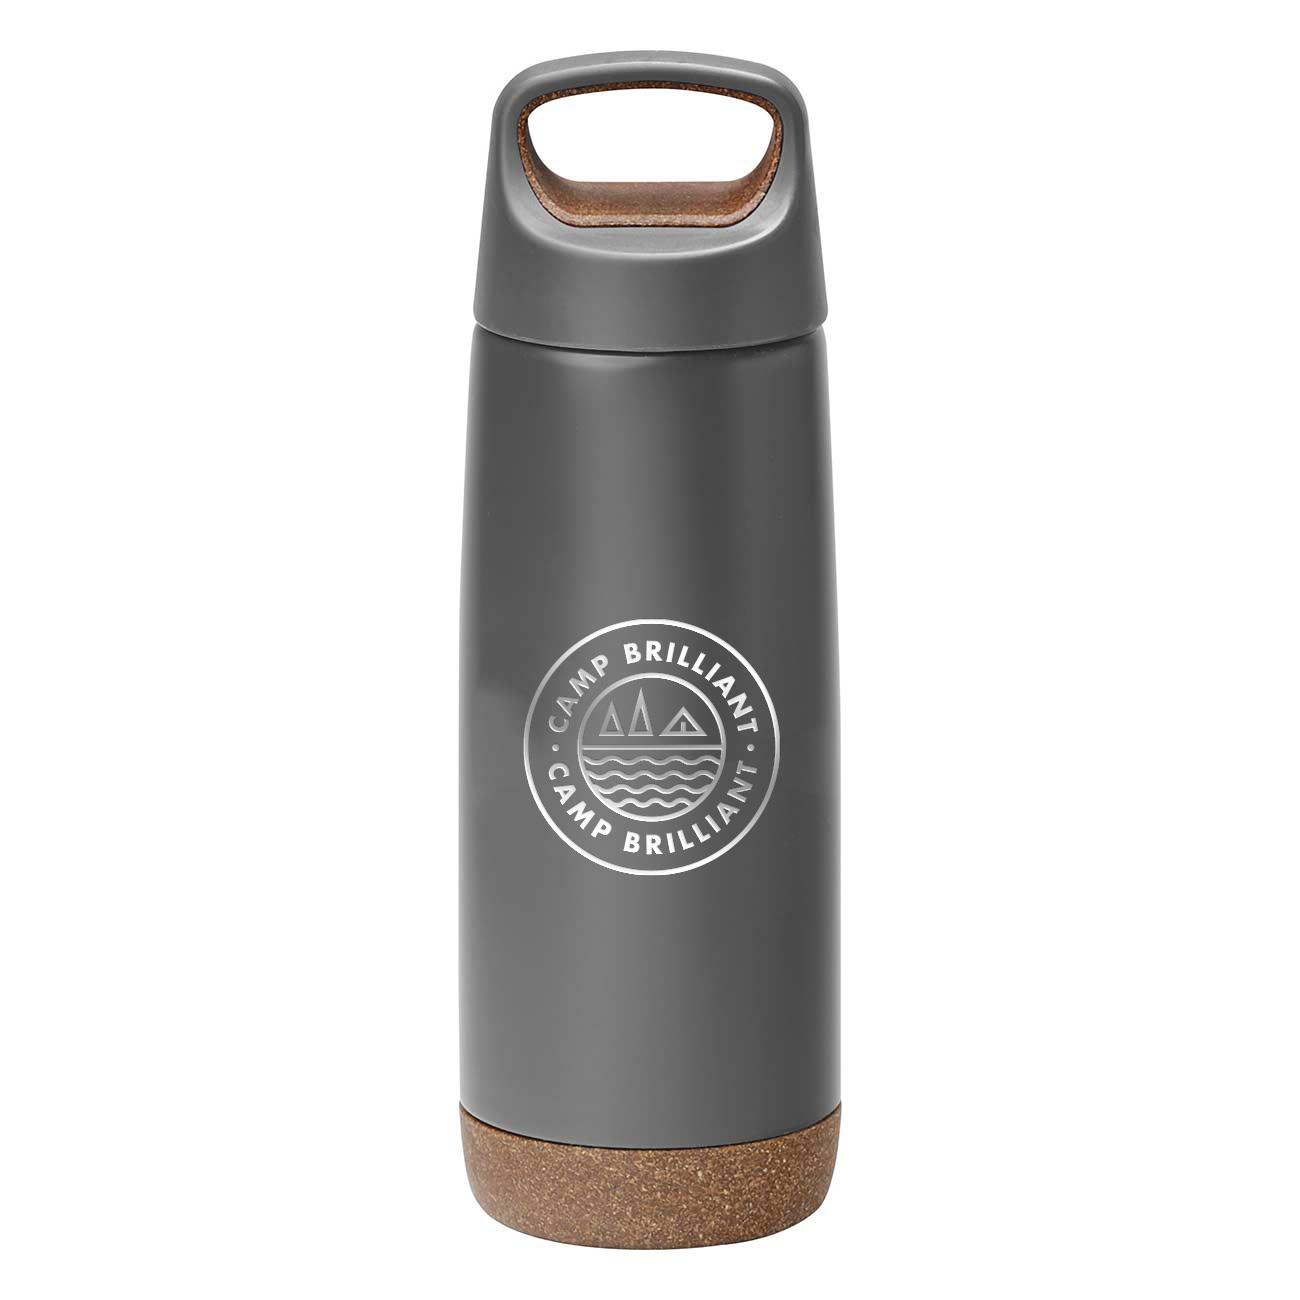 229129 cork vacuum bottle one color one location imprint or laser engraved